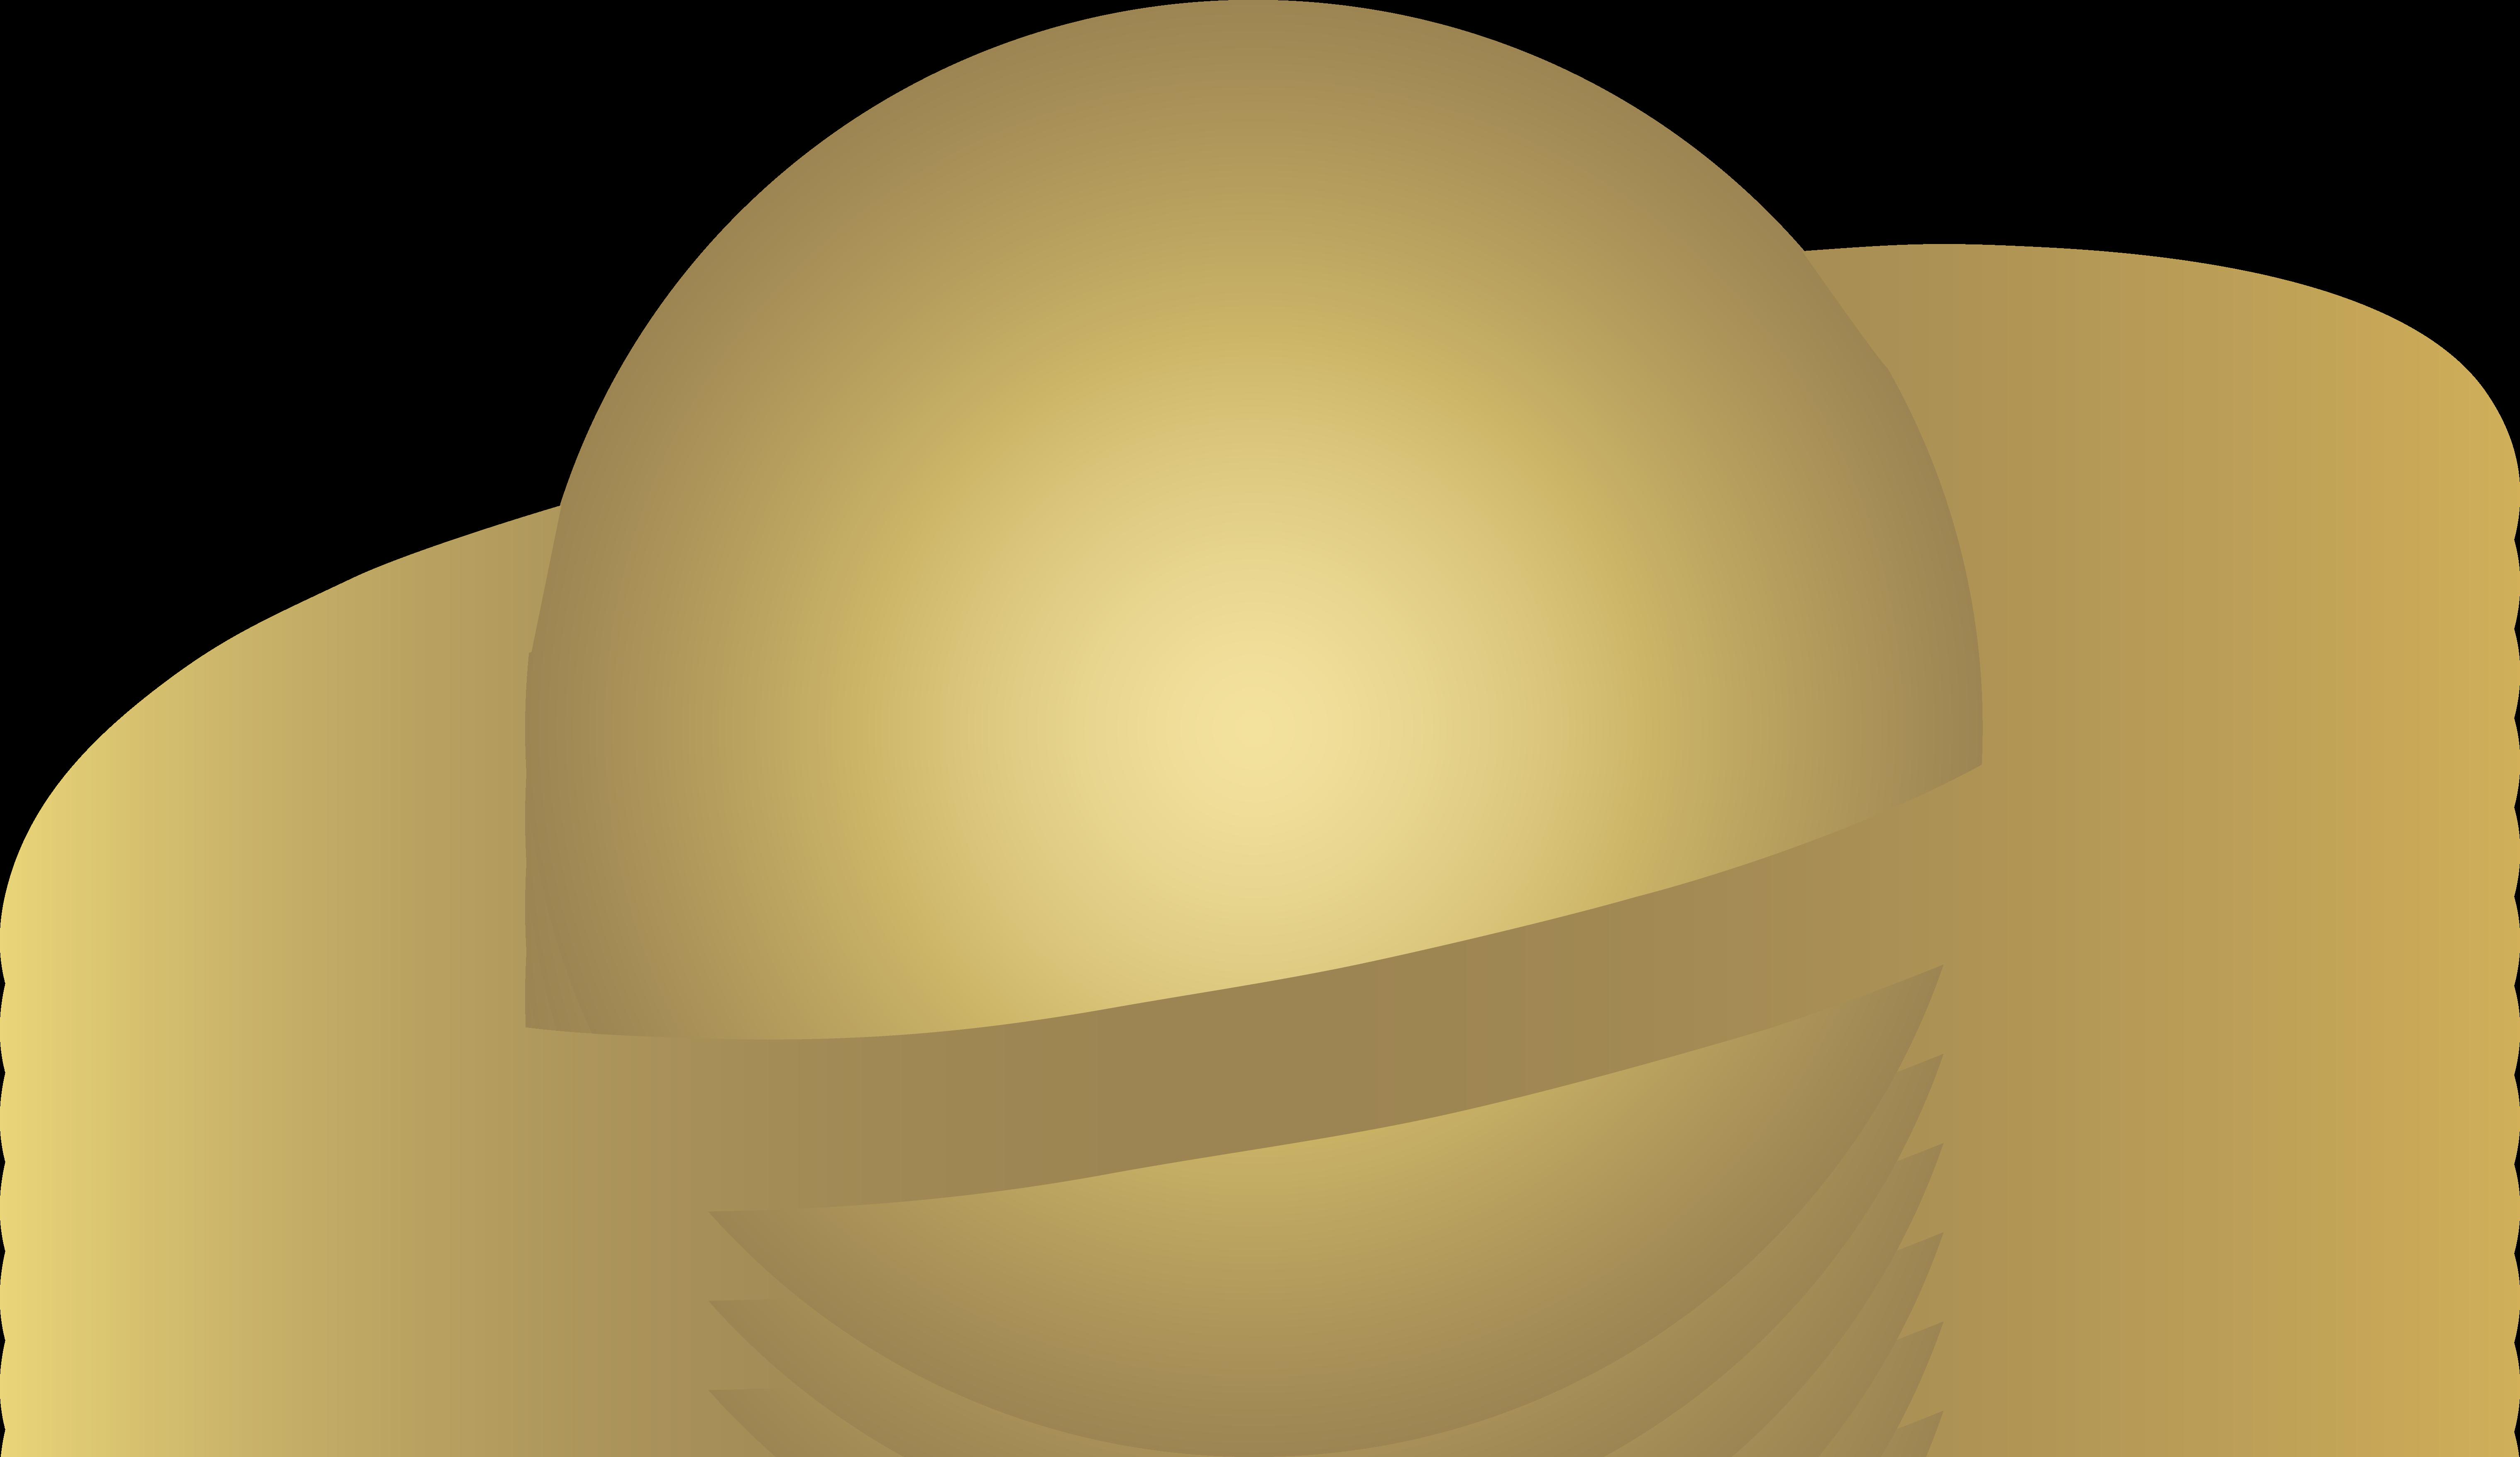 Simple Beige Ringed Alien Planet.